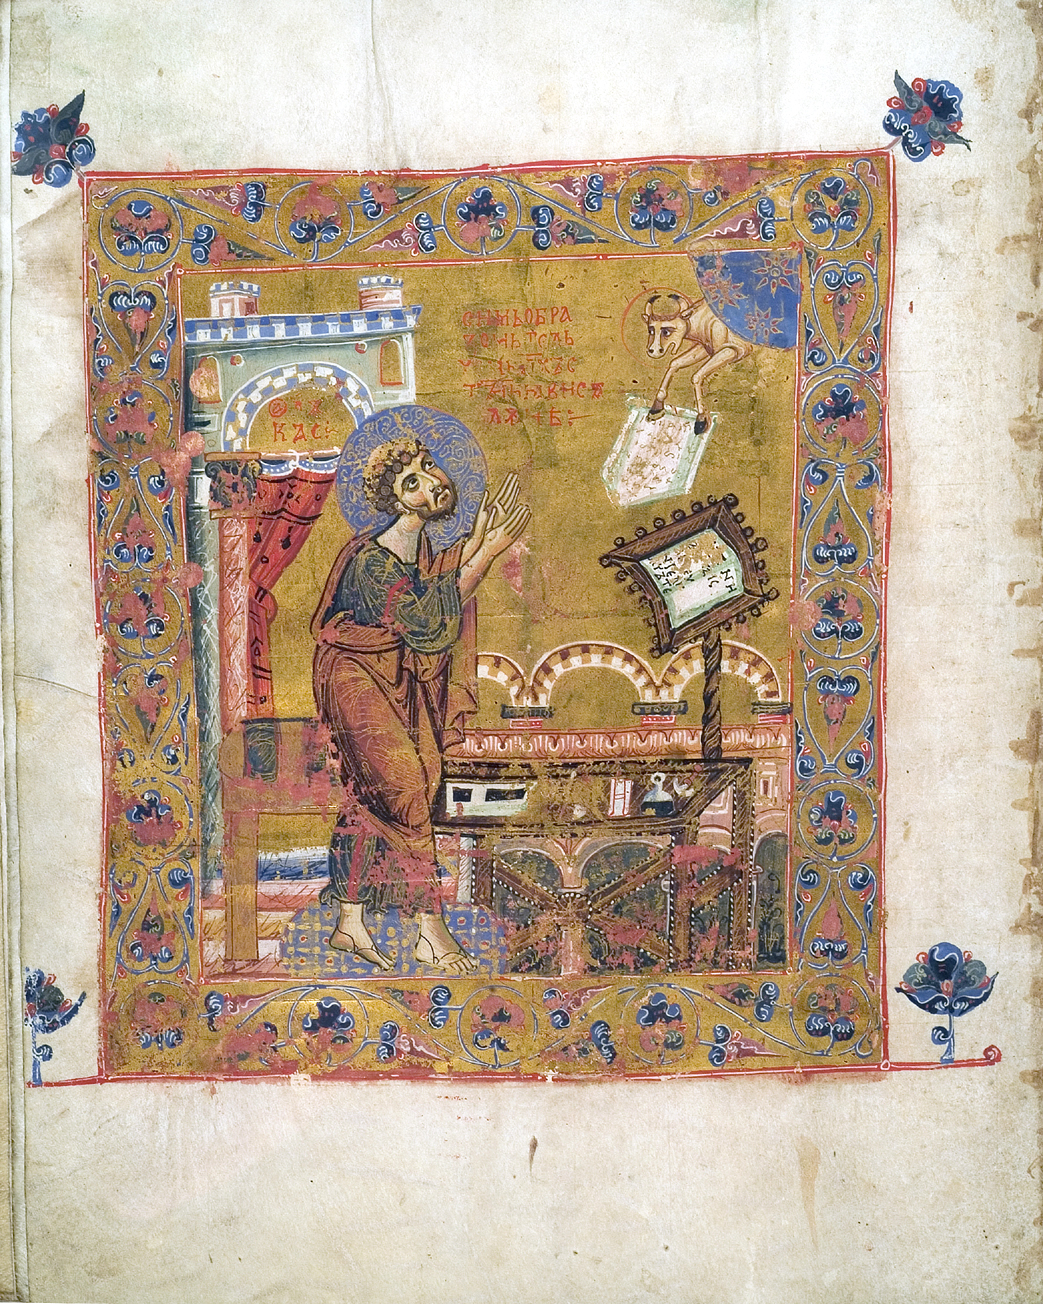 Мстиславово Евангелие, 1103–1113 гг. (ГИМ, Син. 1203). Л. 69 об. Миниатюра с изображением св. евангелиста Луки.